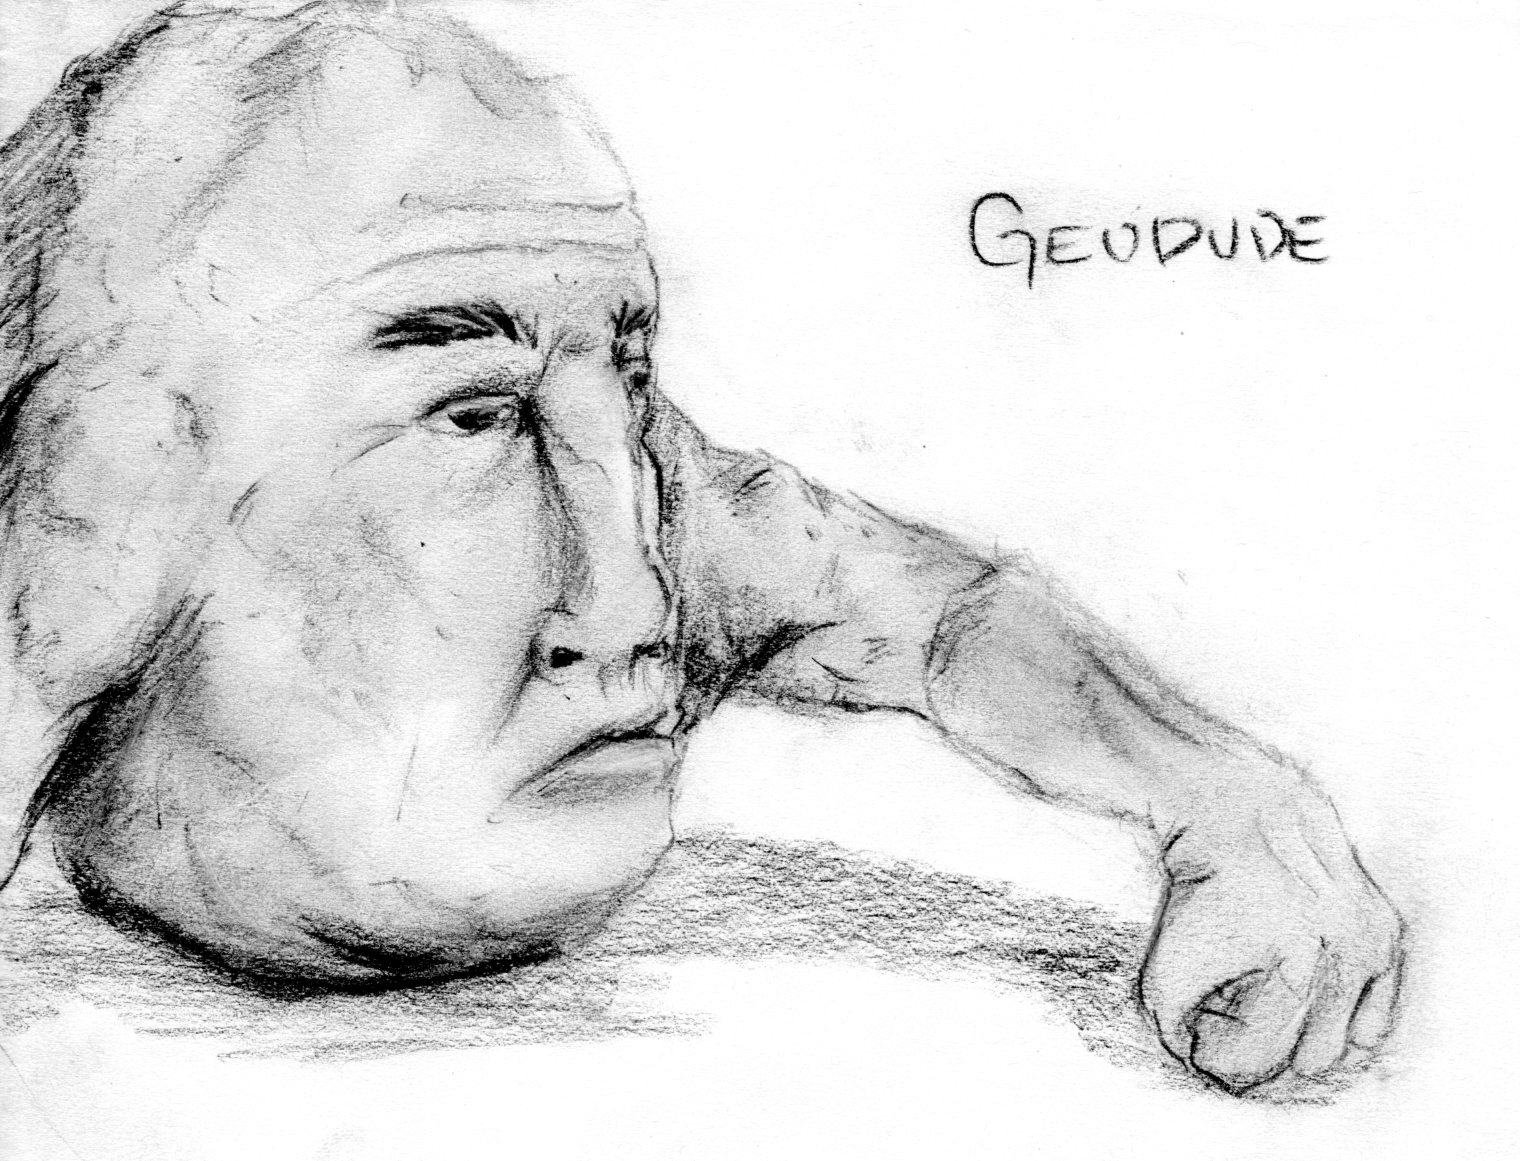 GEODUDE